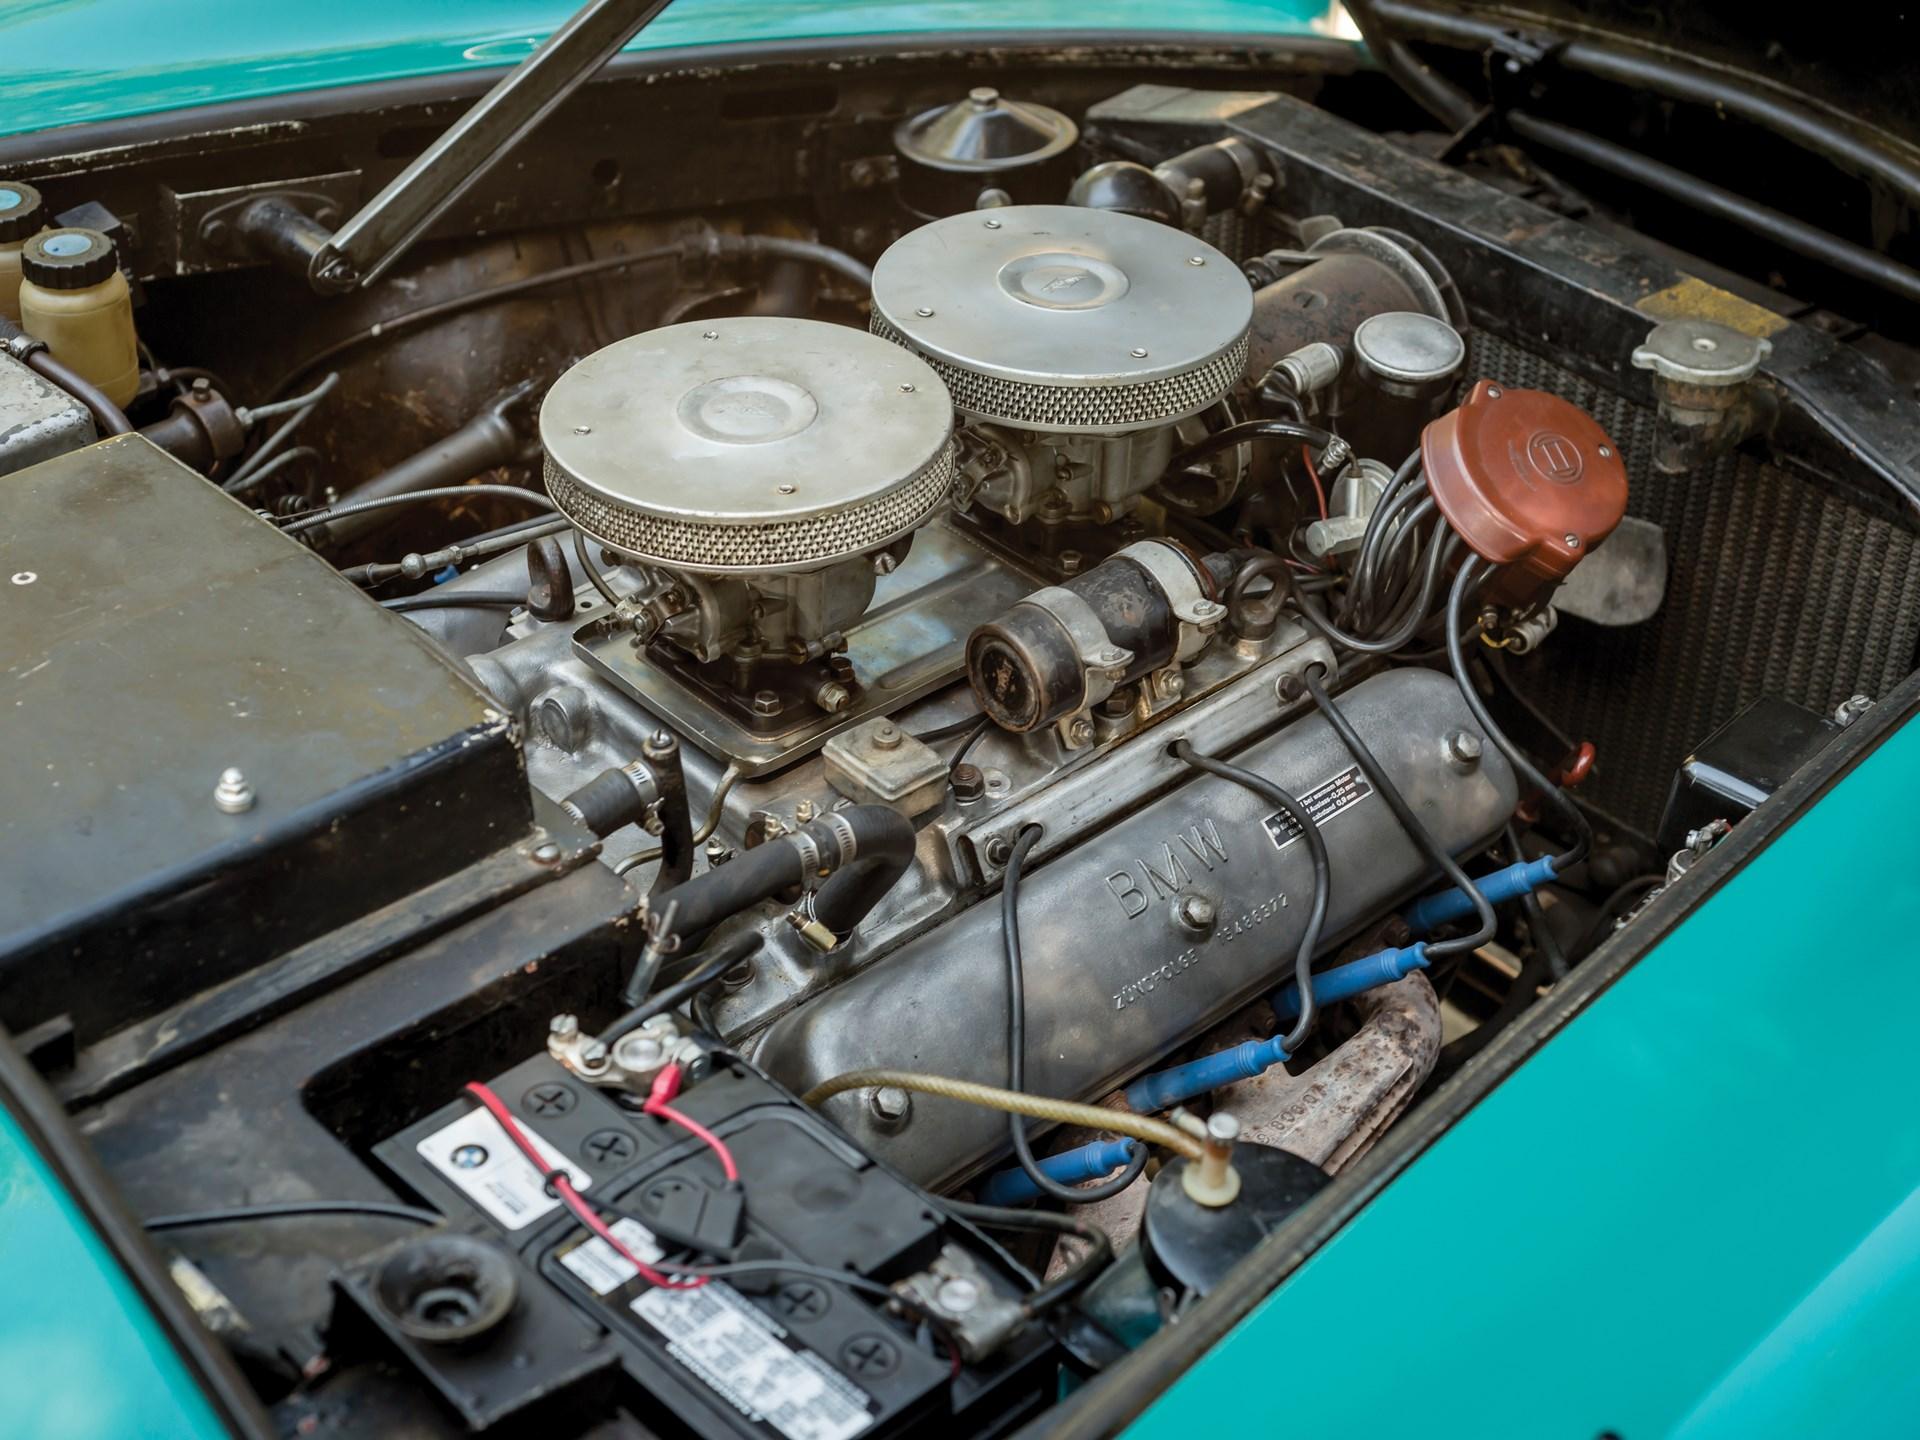 1957 BMW 507 v8 engine